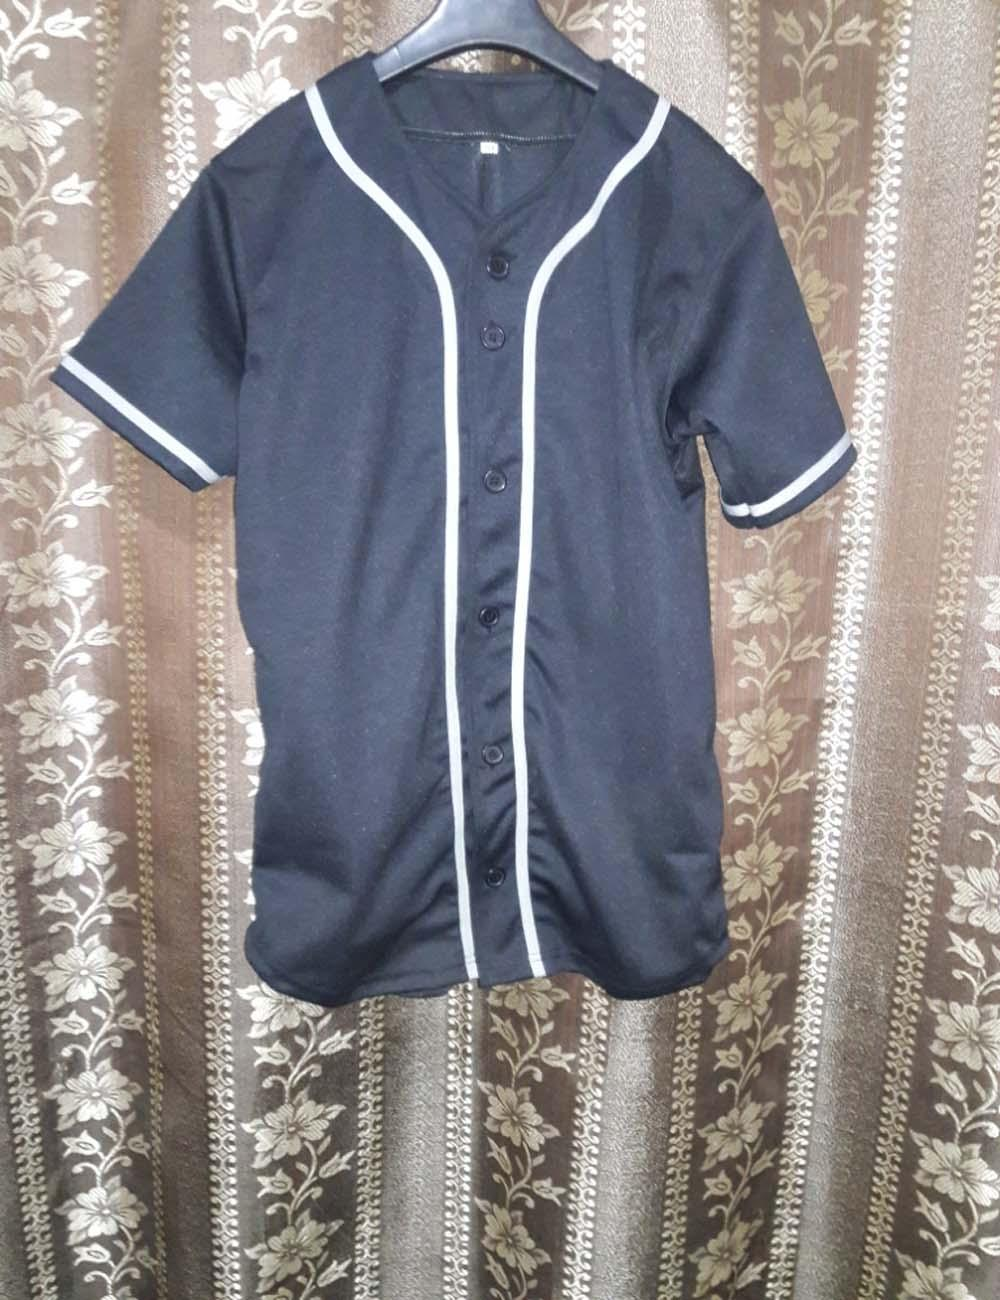 495a82591 custom cheap baseball tee shirts / blank baseball jersey / plain wholesale baseball  jerseys